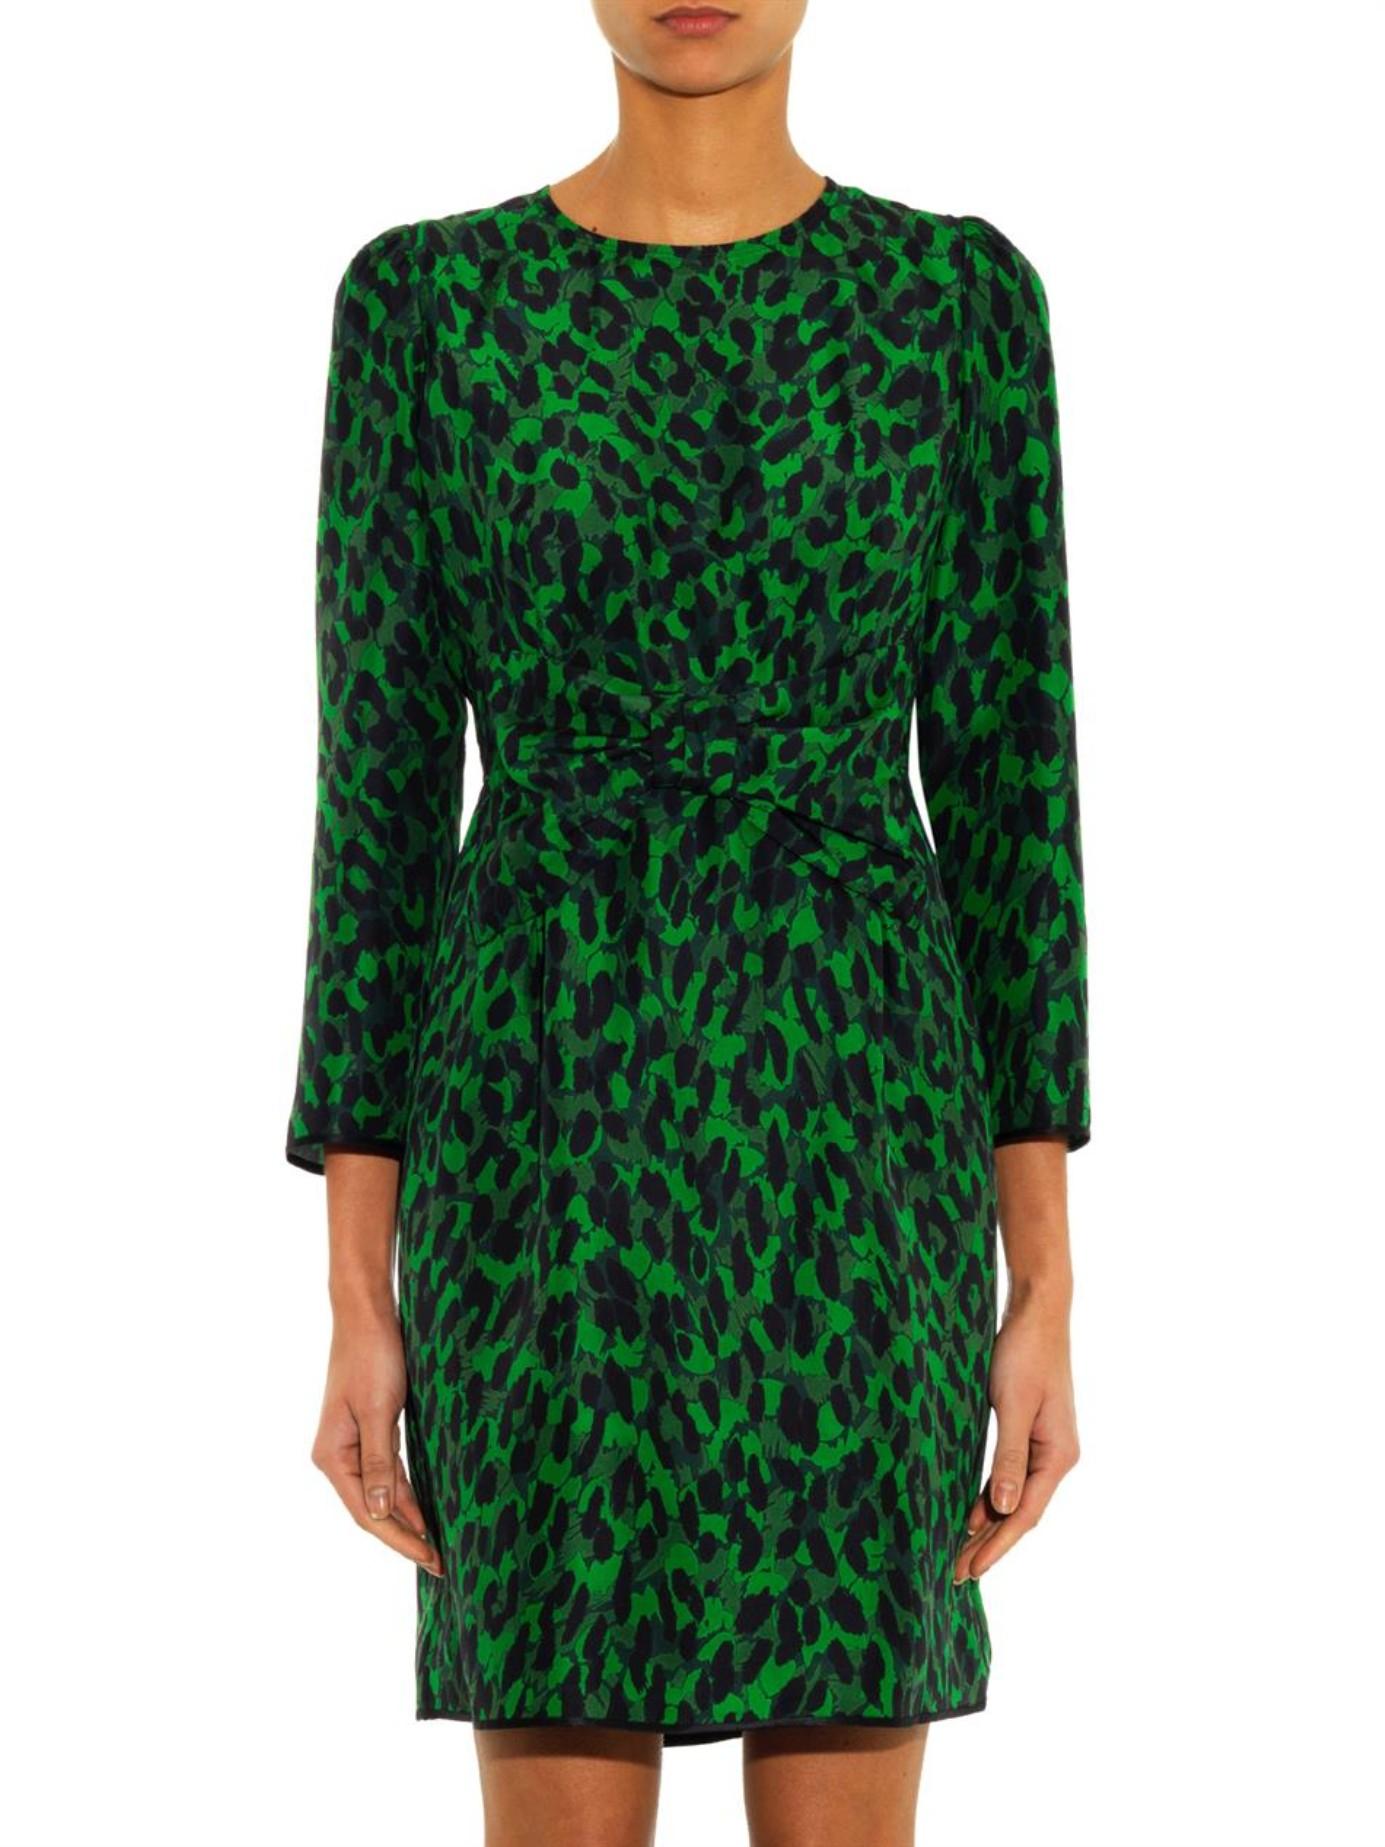 Silk Leopard Dress Silk Leopard Dress new picture